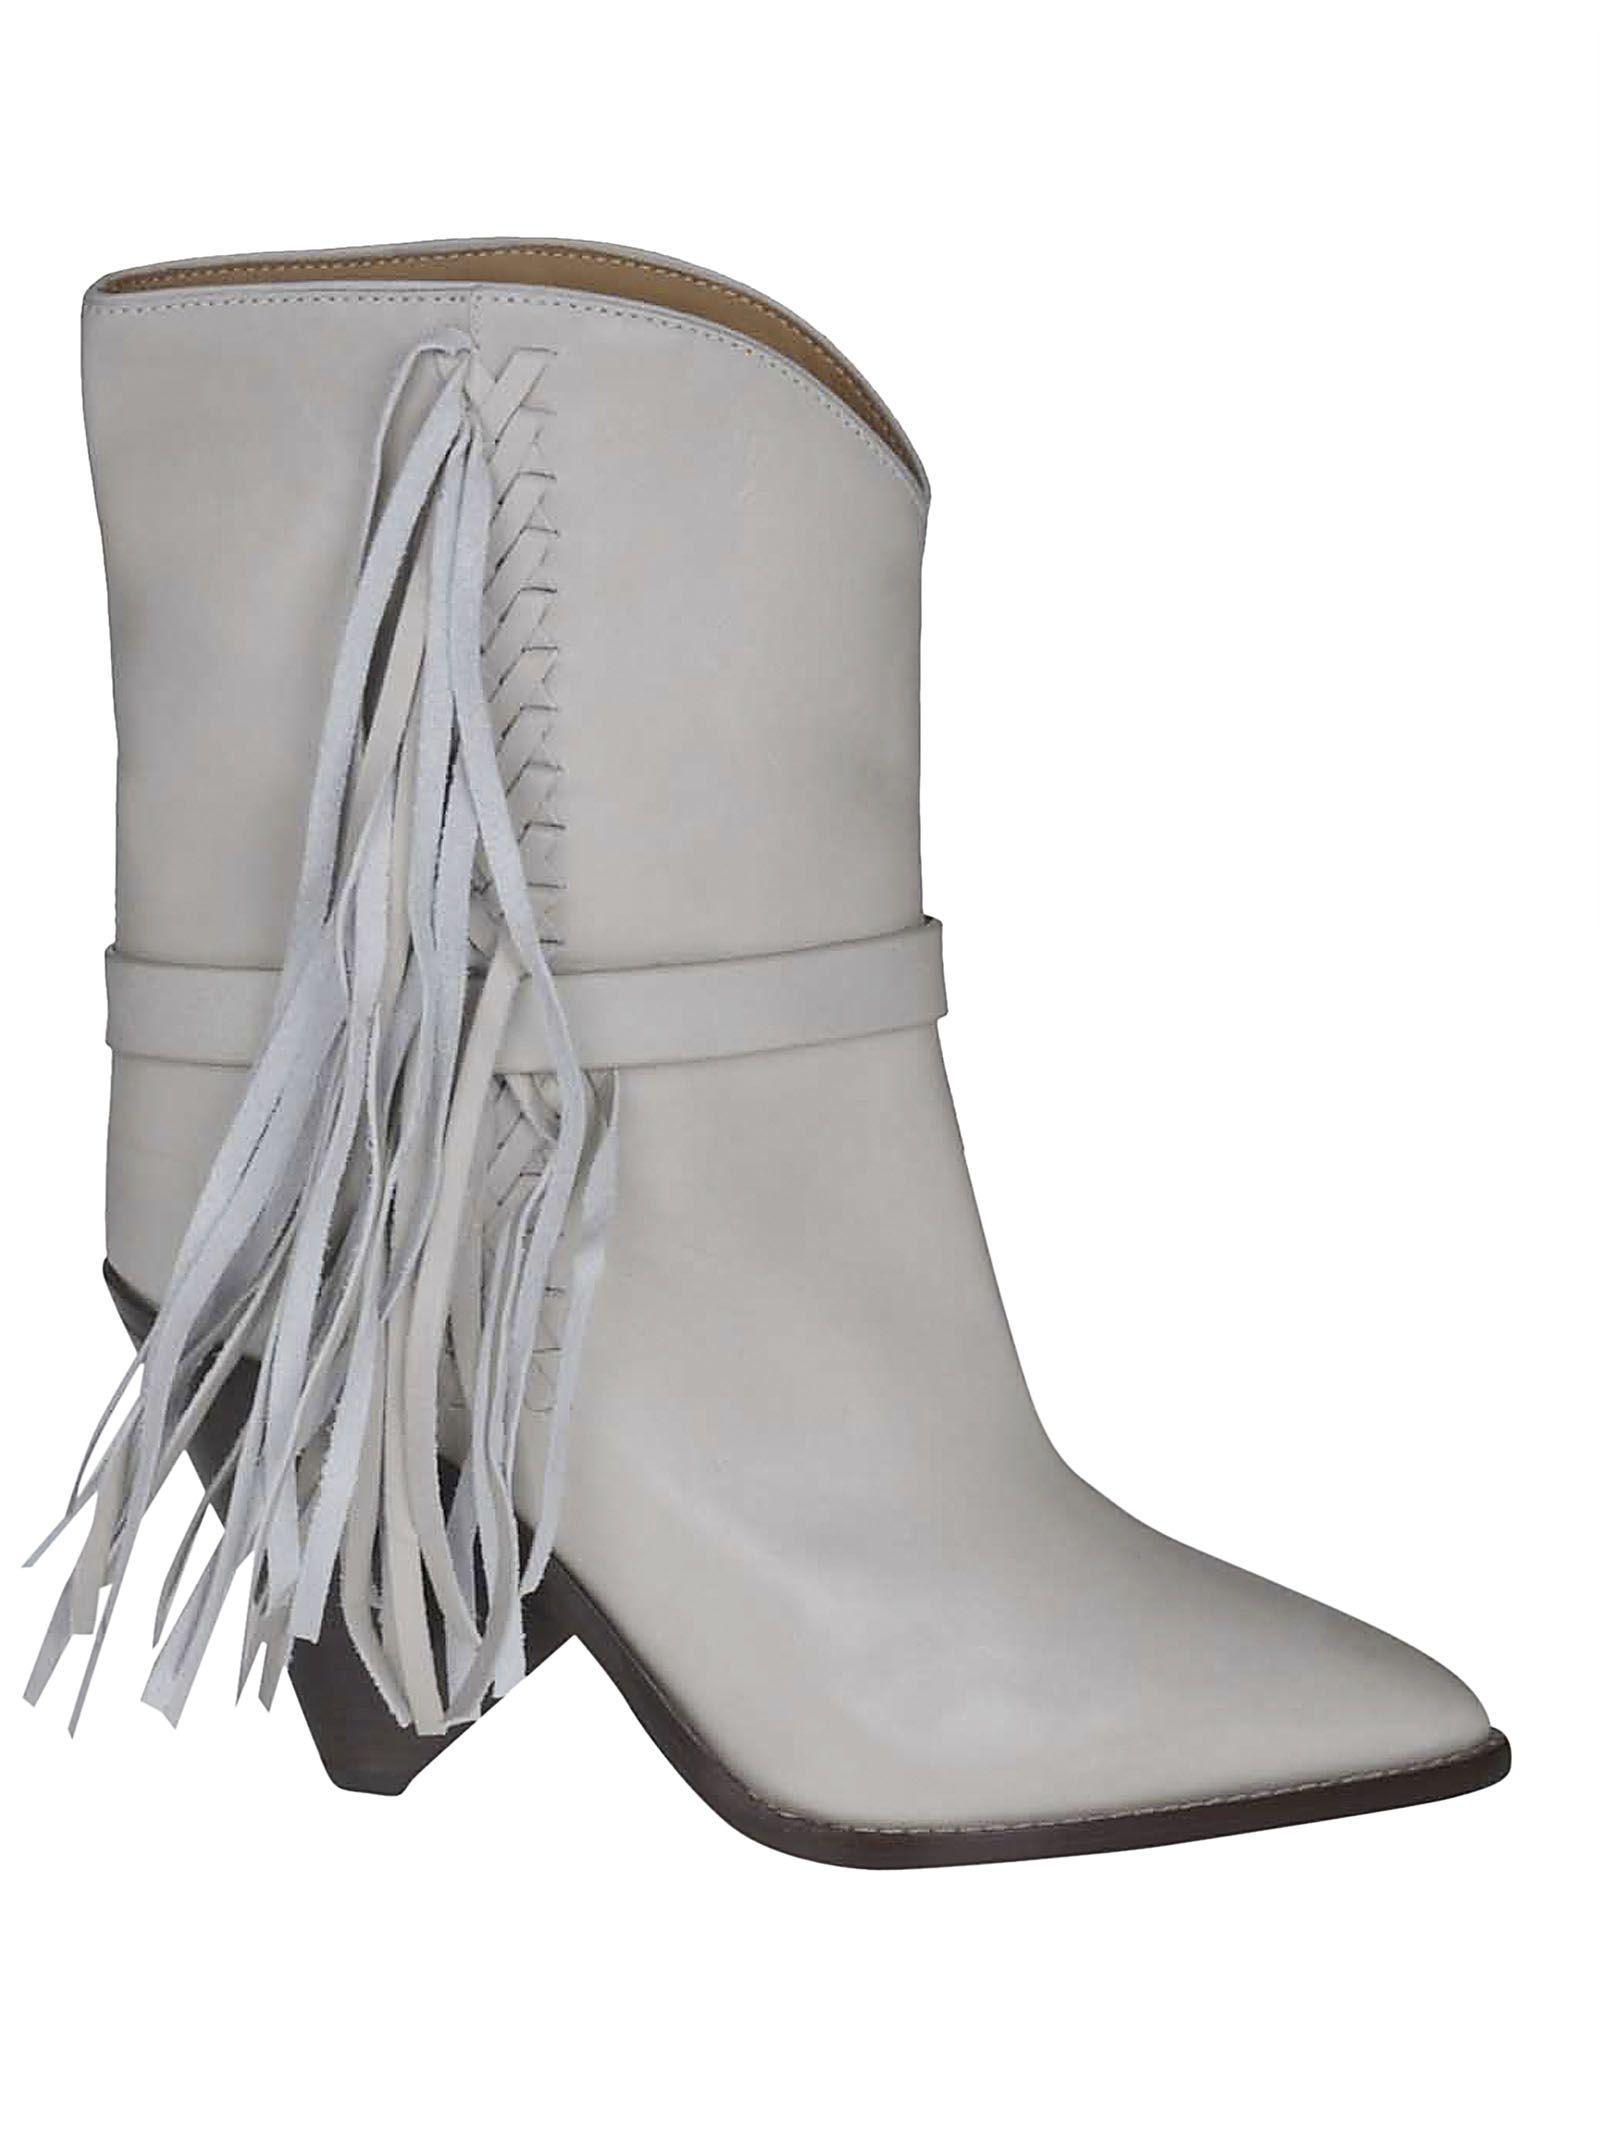 94899dd7e75 Isabel Marant étoile Tassel Detail Ankle Boots